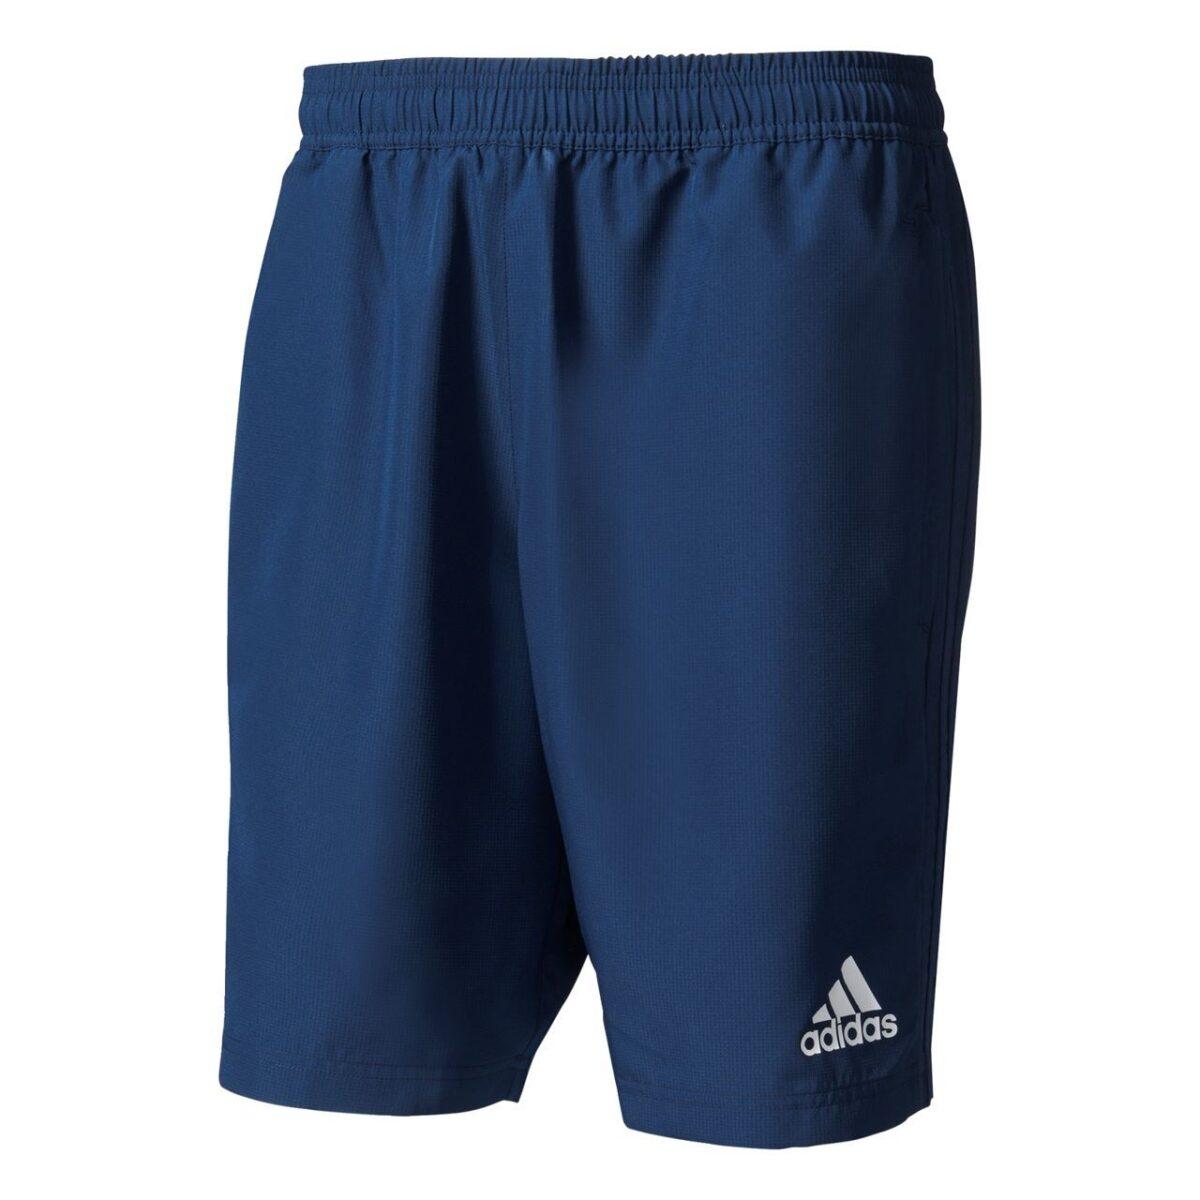 Adidas Tiro 17 Woven Shorts BQ2647 Collegiate Navy/White